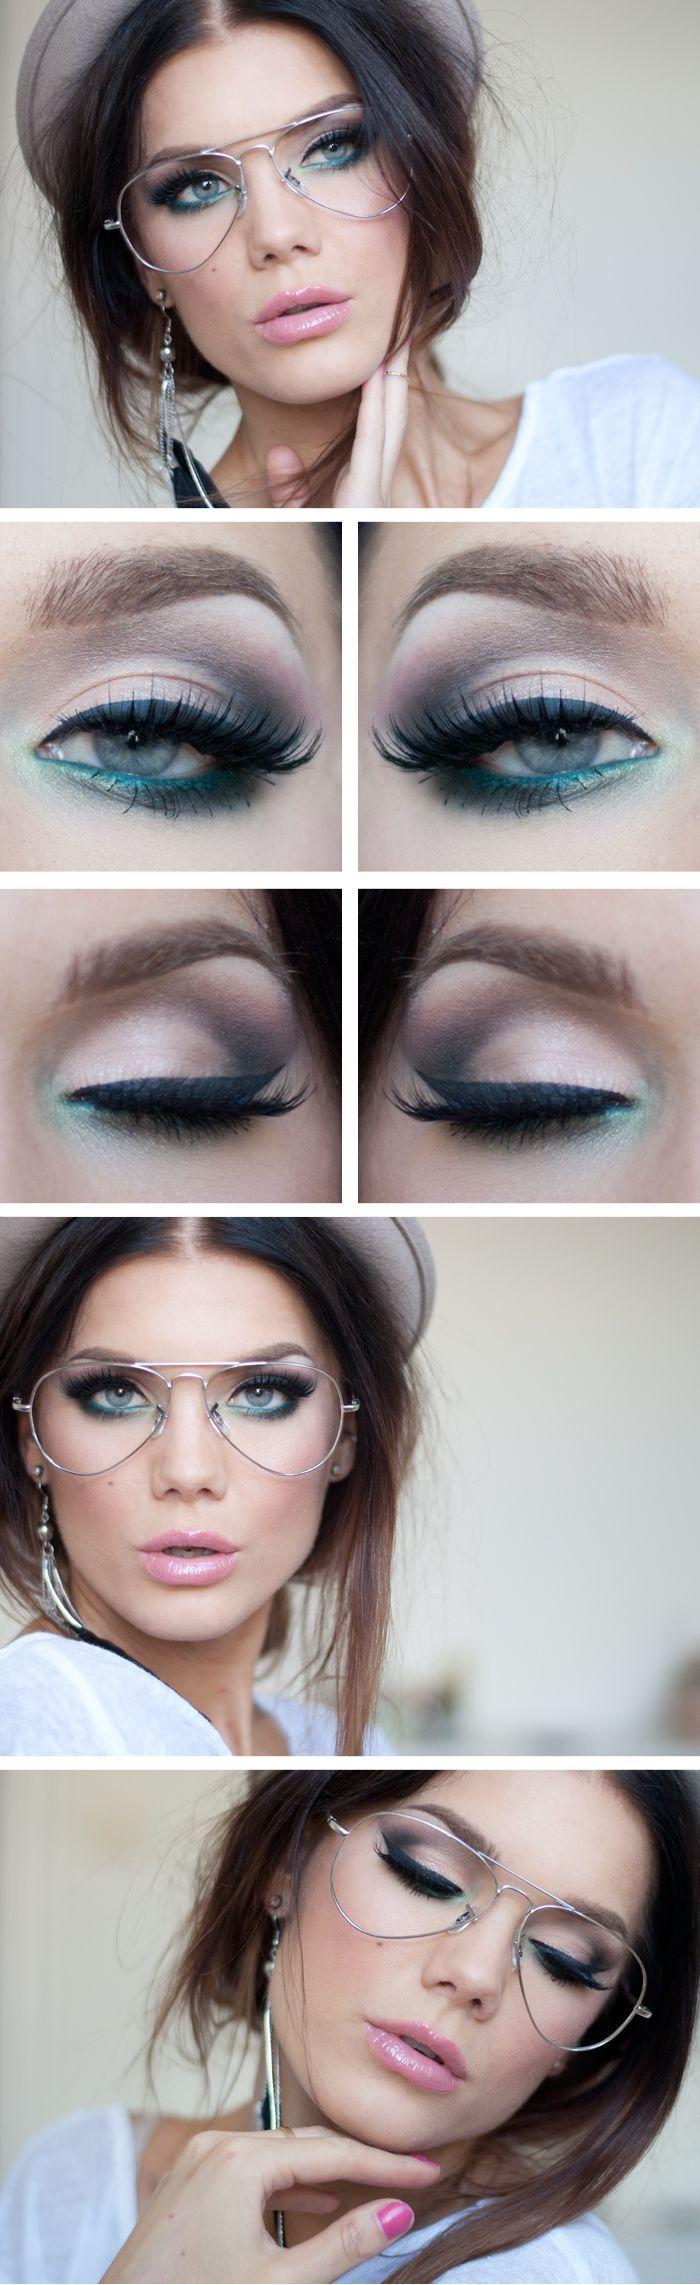 Best 20+ How To Wear Eyeliner Ideas On Pinterest  Winged Eyeliner Tricks,  Pencil Eyeliner Tutorial And Makeup For You